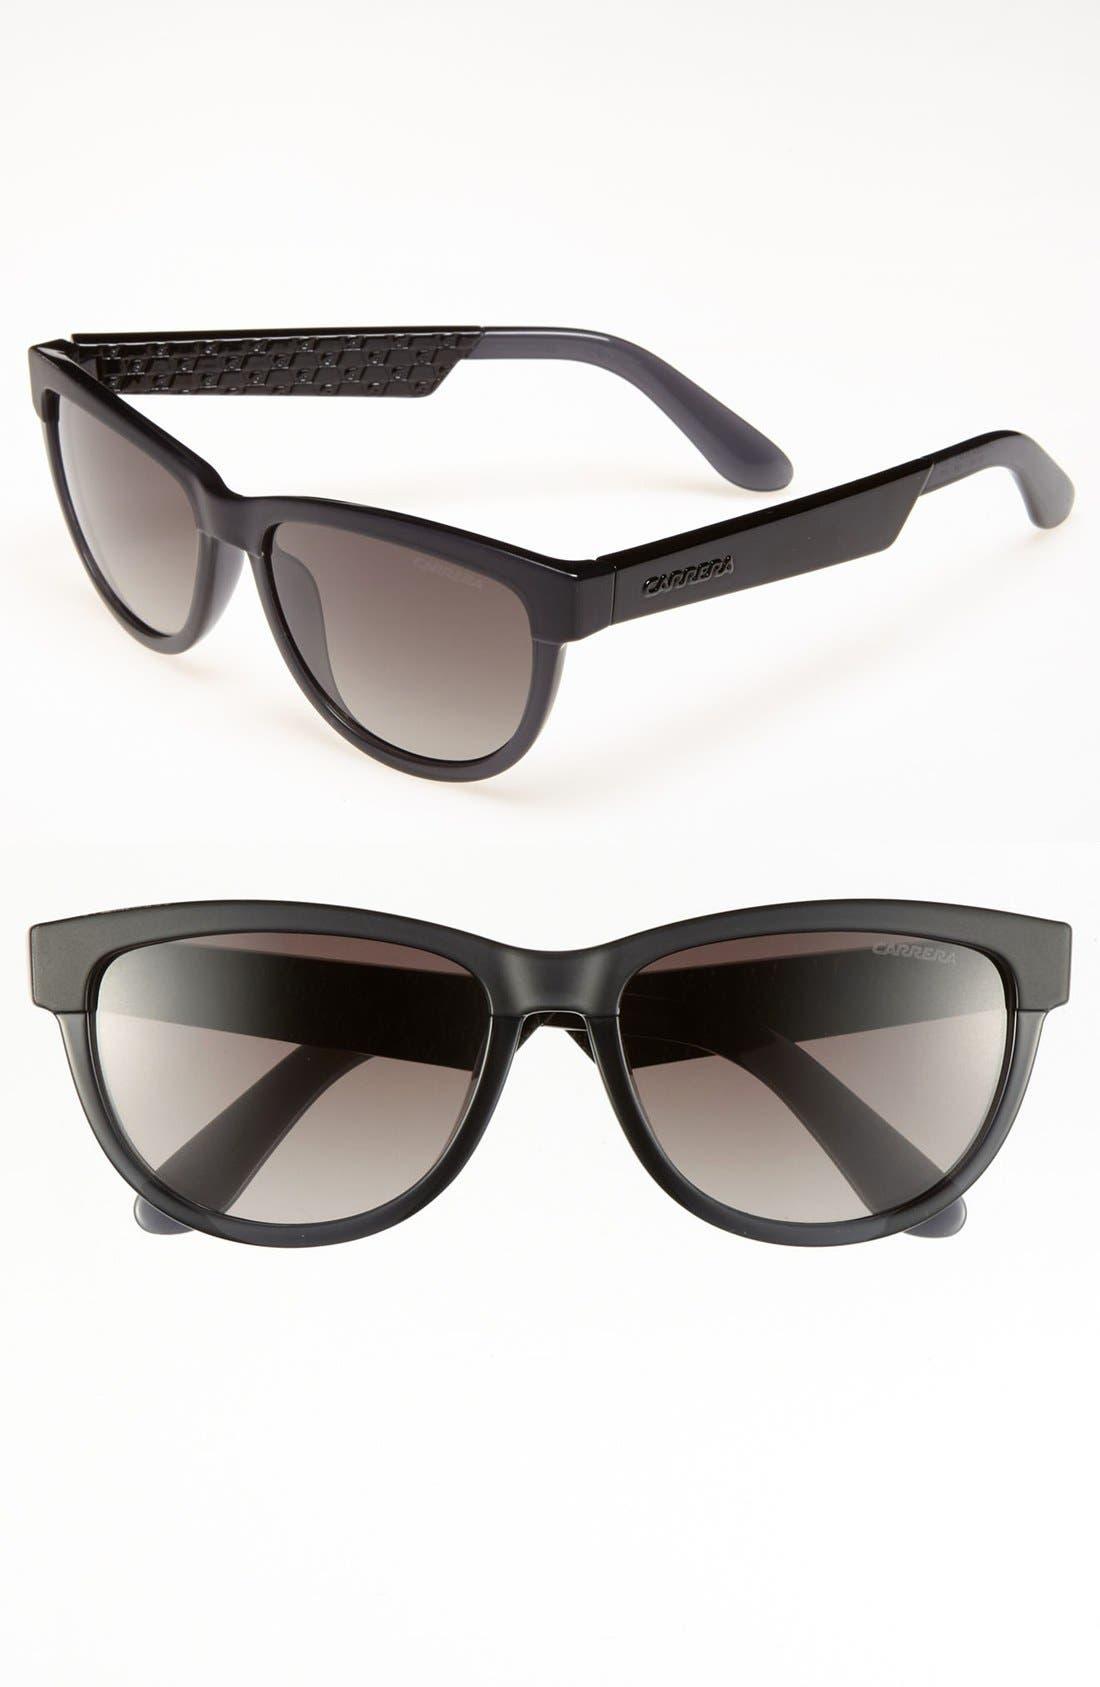 55mm Sunglasses,                             Main thumbnail 1, color,                             020